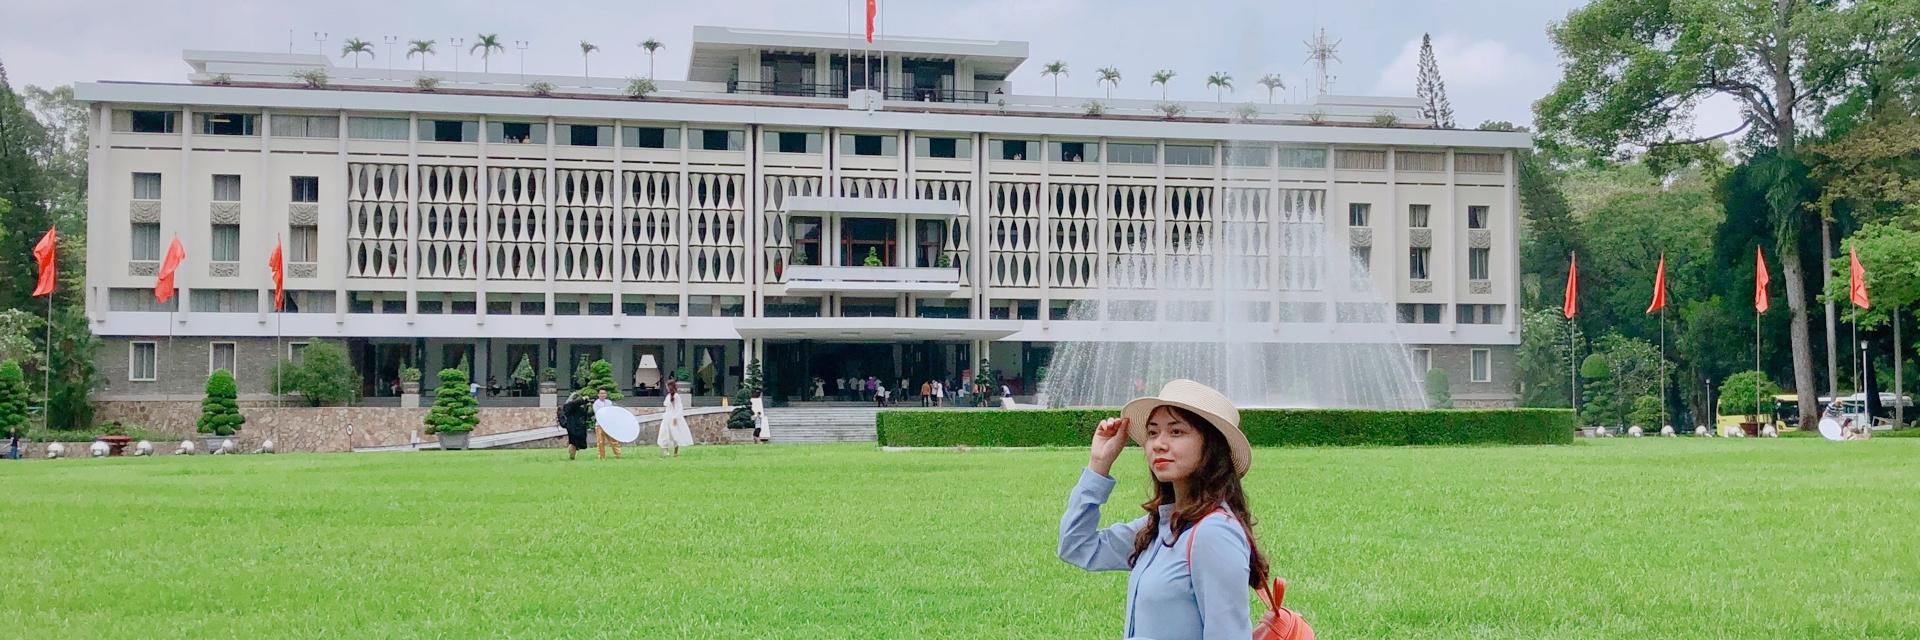 https://gody.vn/blog/olipnoi4502/post/dinh-doc-lap-dia-diem-lich-su-khong-the-bo-lo-khi-den-sai-gon-8514